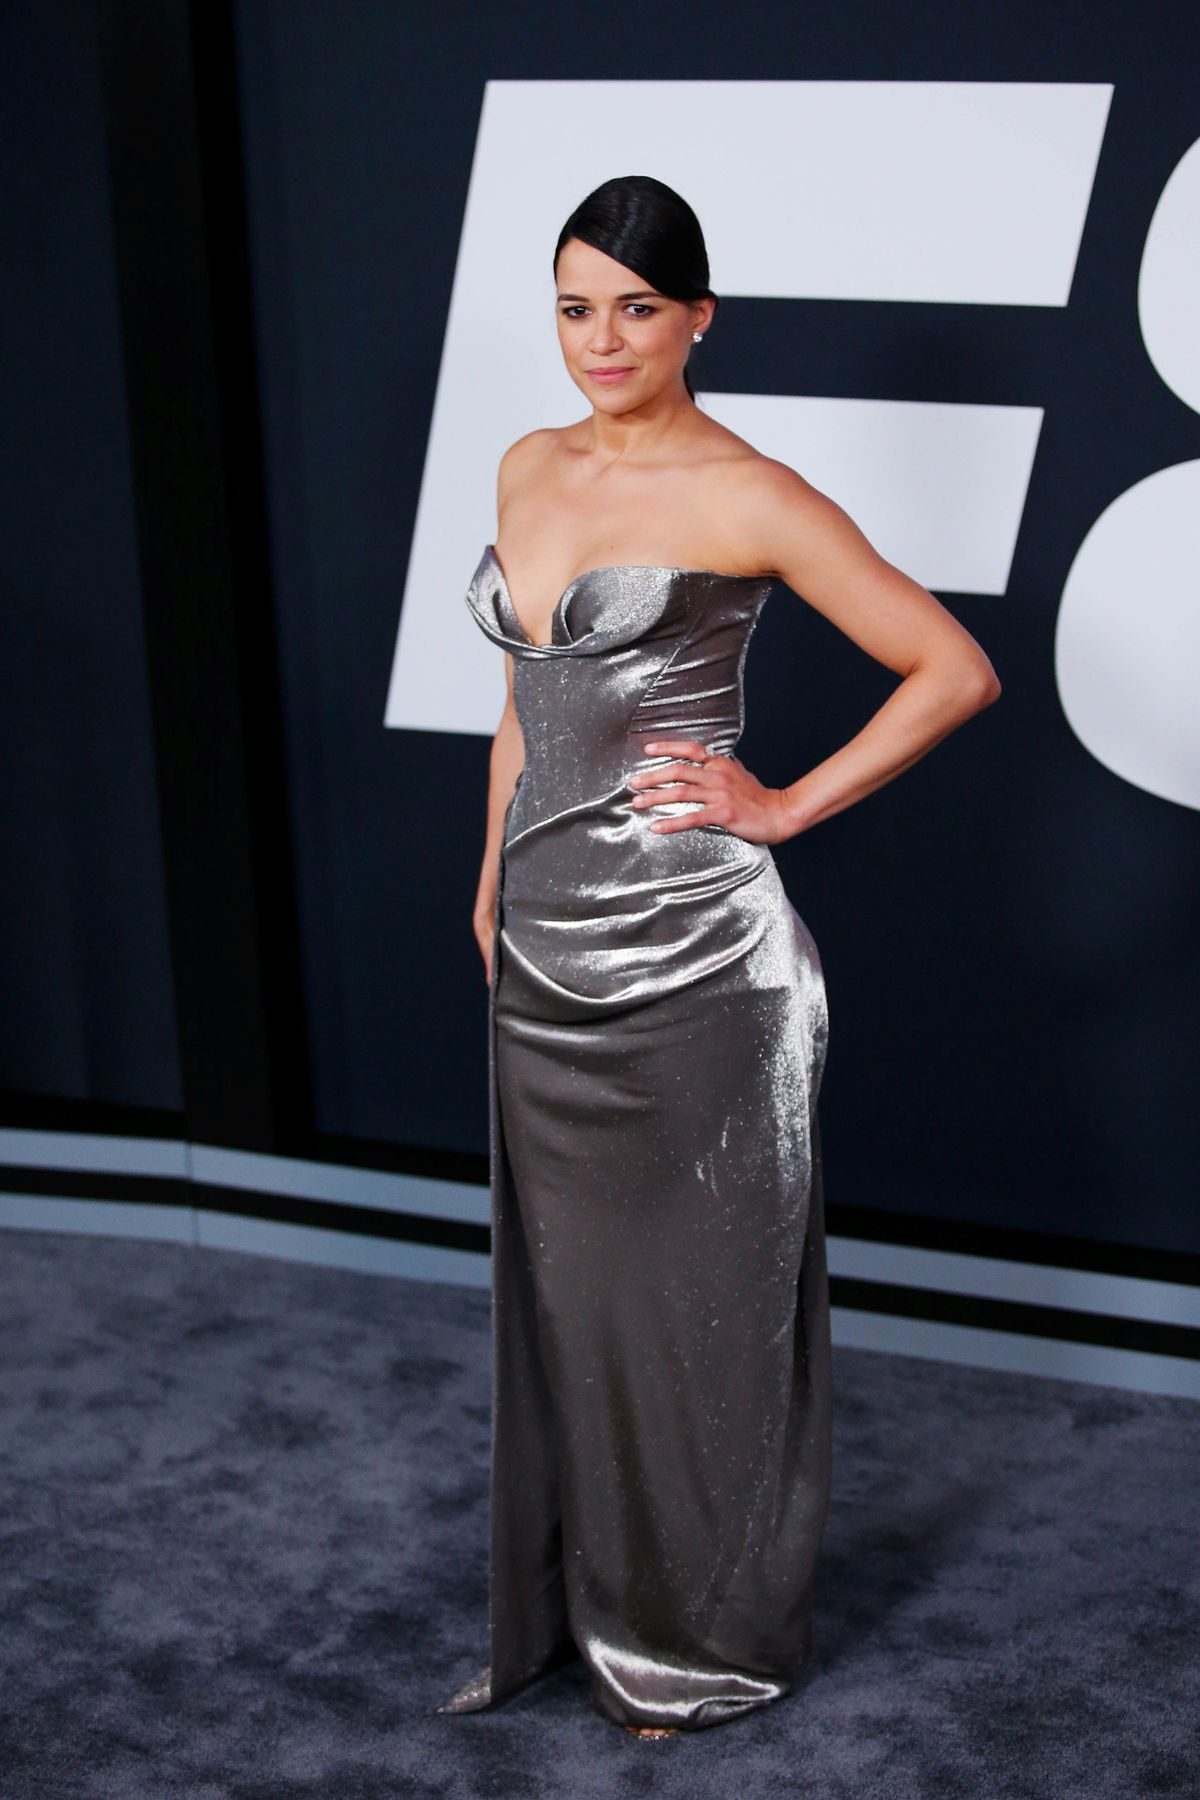 Michelle Rodriguez  na premiére filmu Rýchlo a zbesilo 8 v New Yorku v šatách Vivienne Westwood.